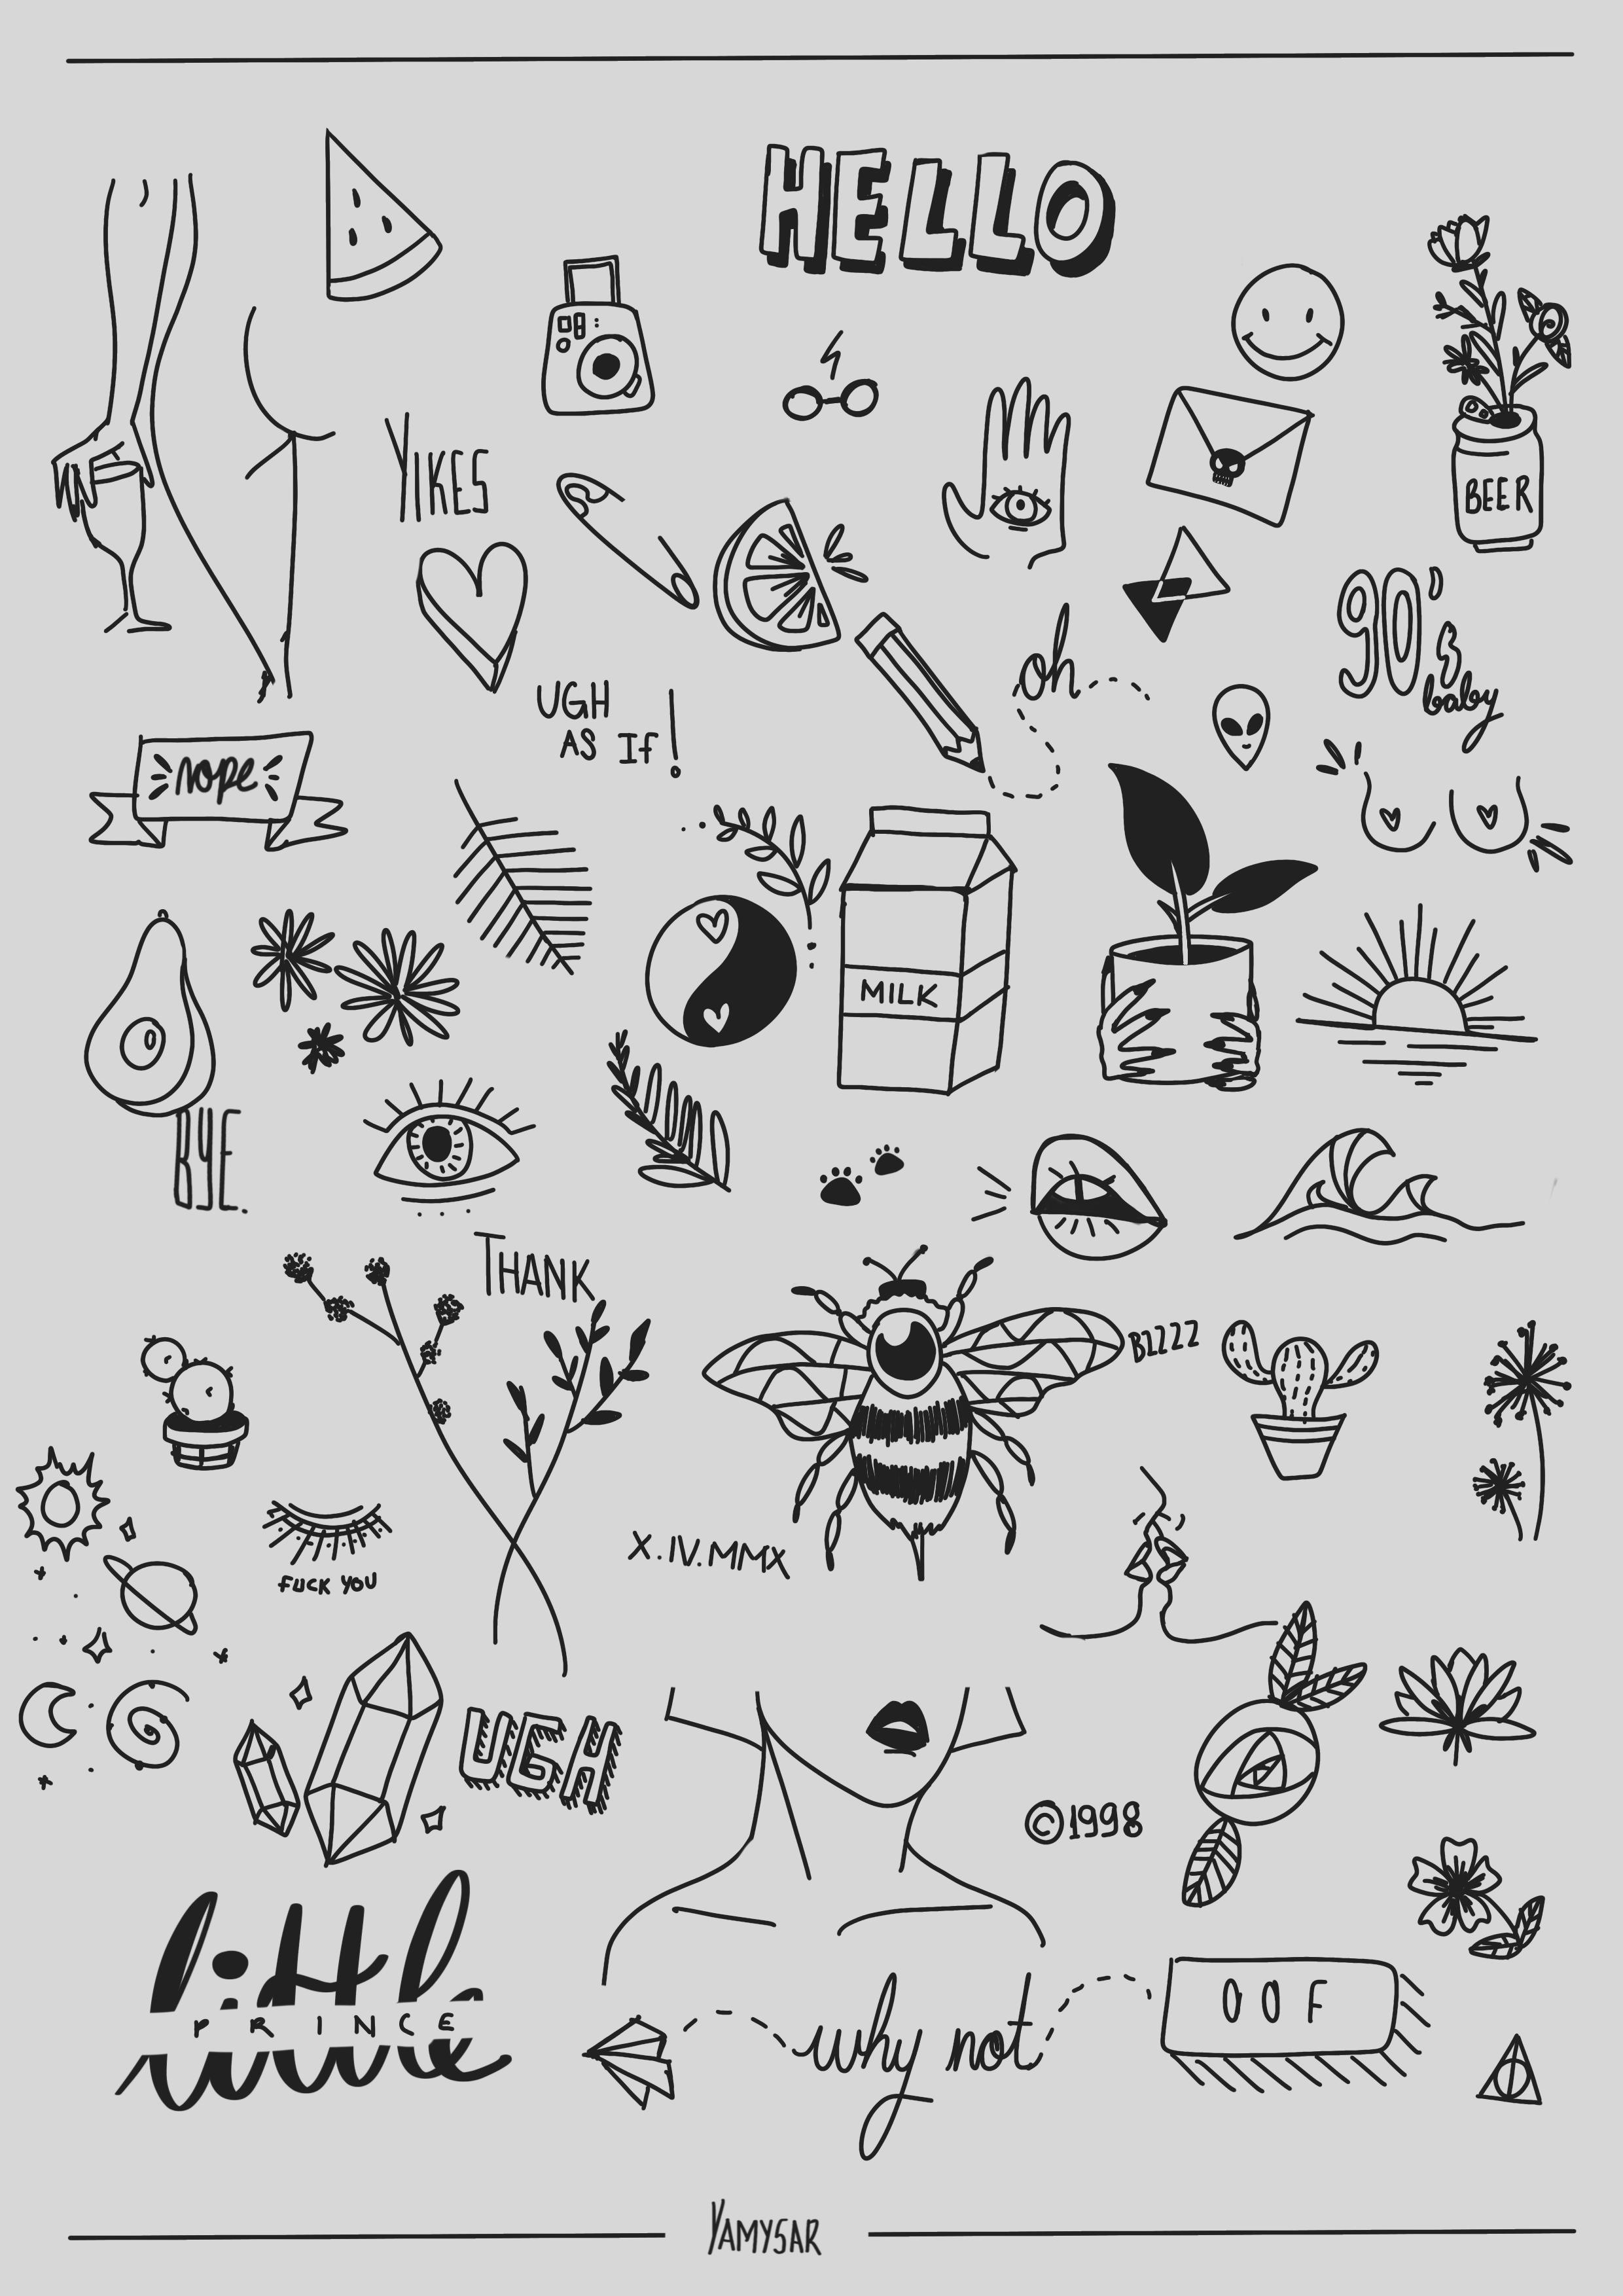 Pin Von Robin Polito Auf Drawings Kleine Tattoo Ideen Kritzelei Tattoo Flash Art Tattoos